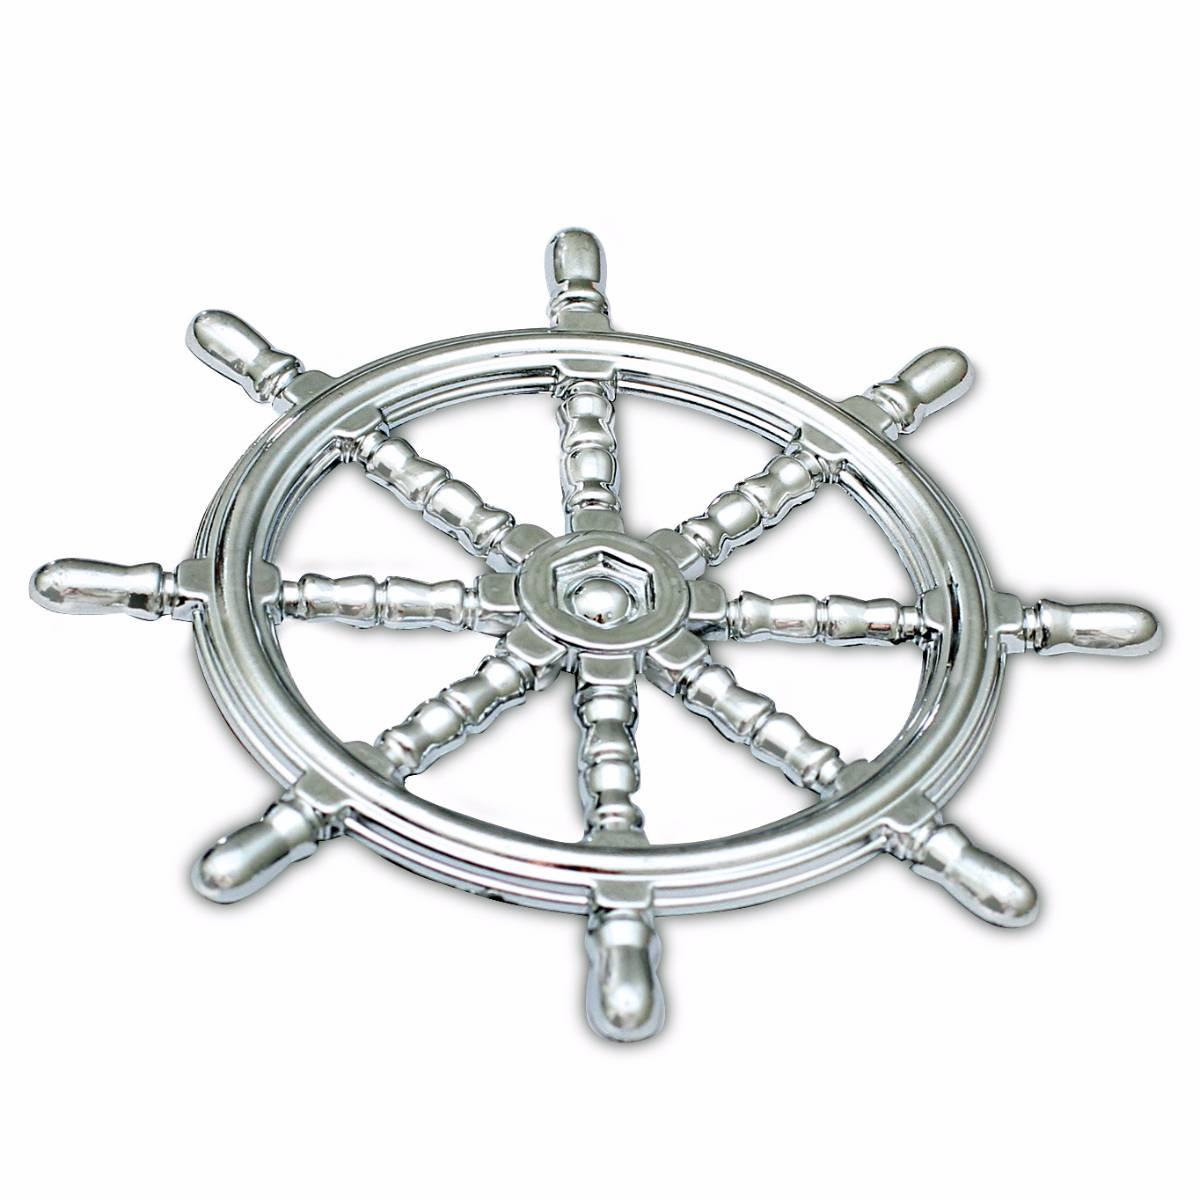 Emblem Variasi Setir Kapal